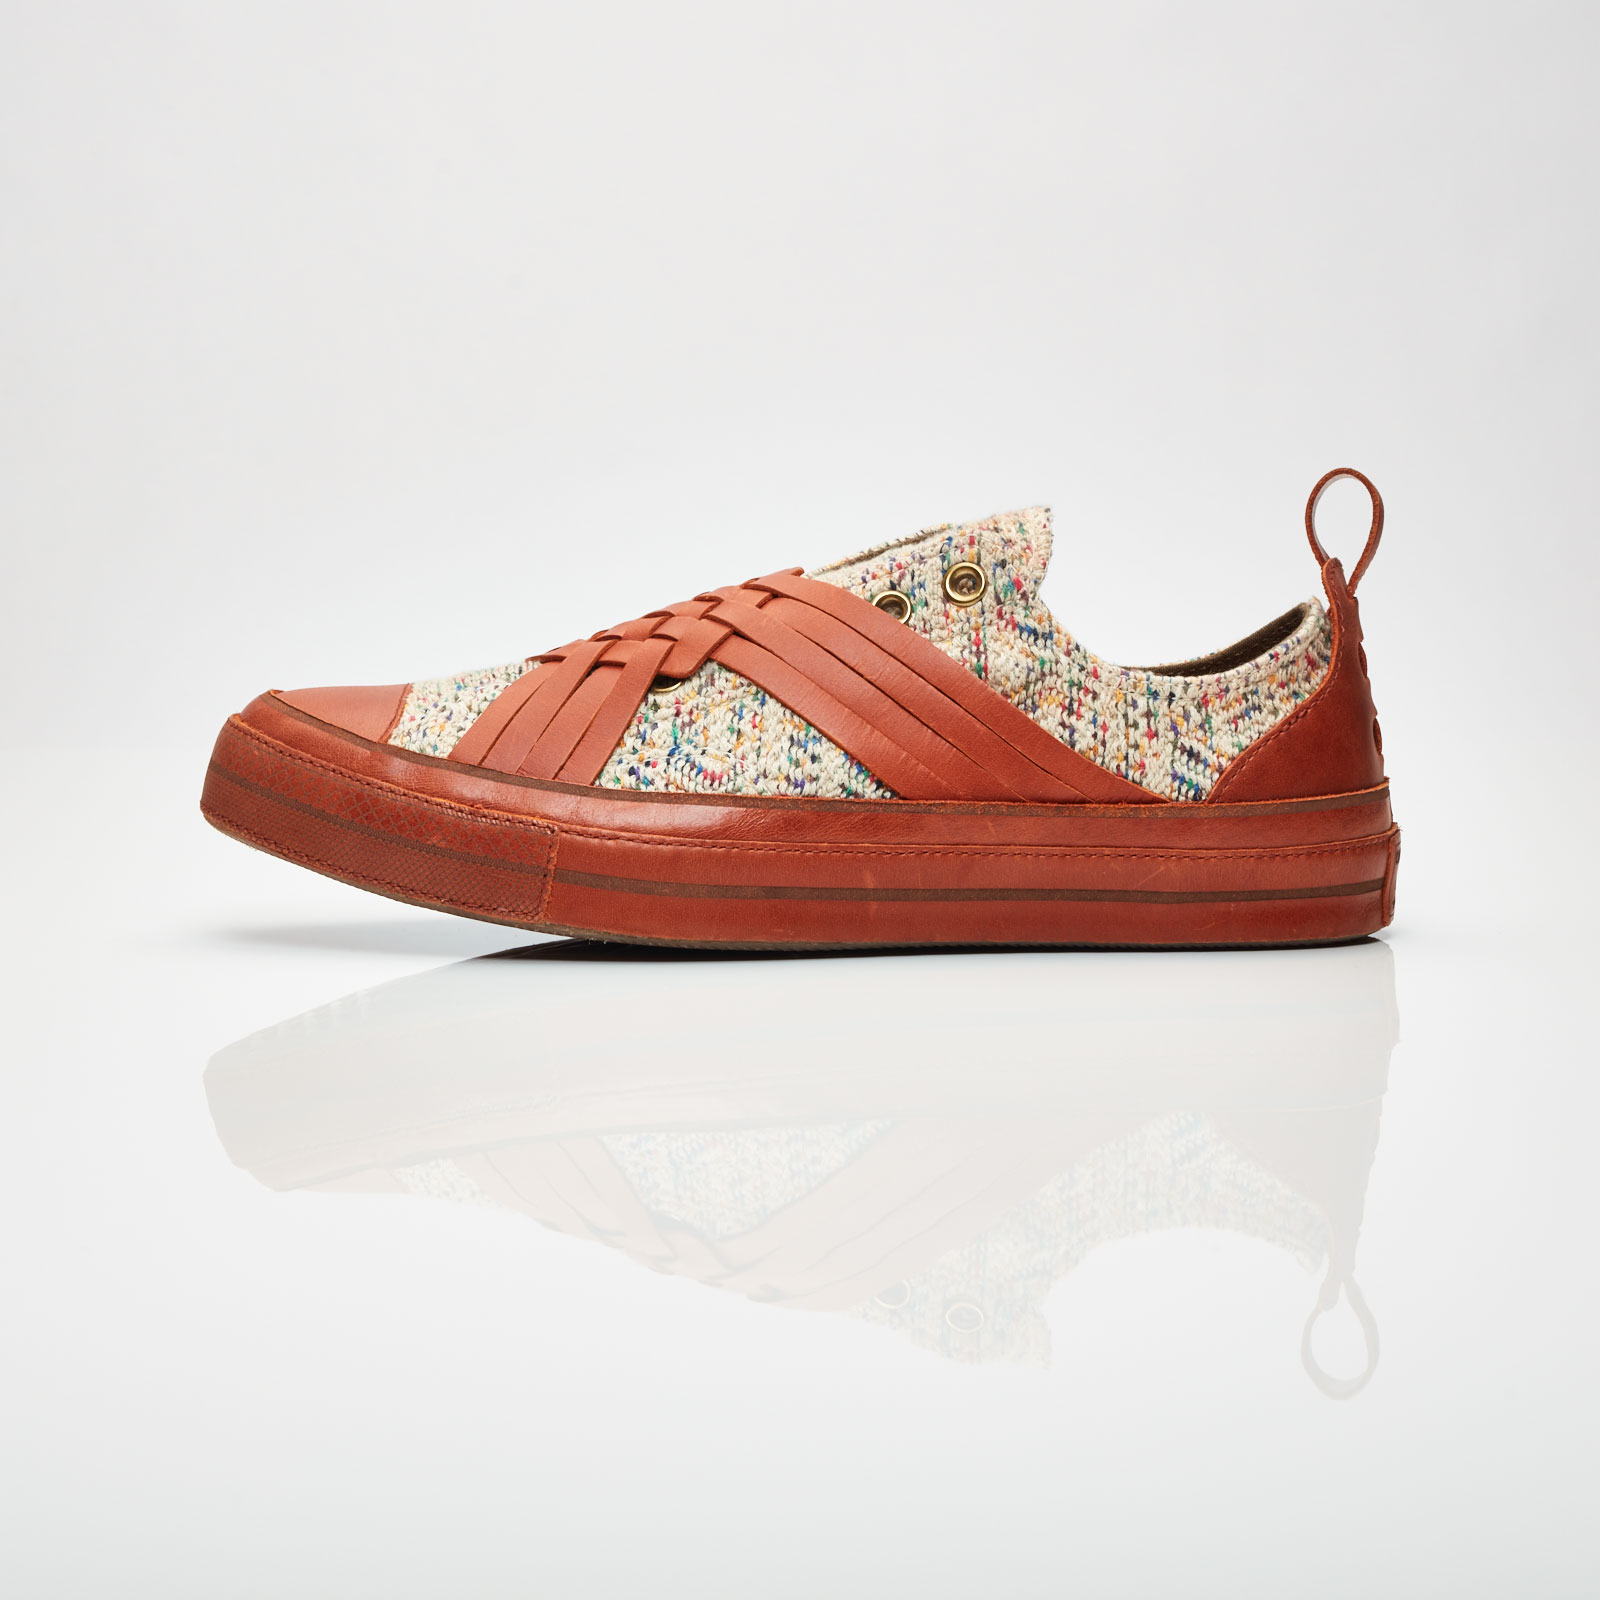 c1d6d8b5279e Converse Chuck 70s Slip x Missoni - 157258c - Sneakersnstuff ...